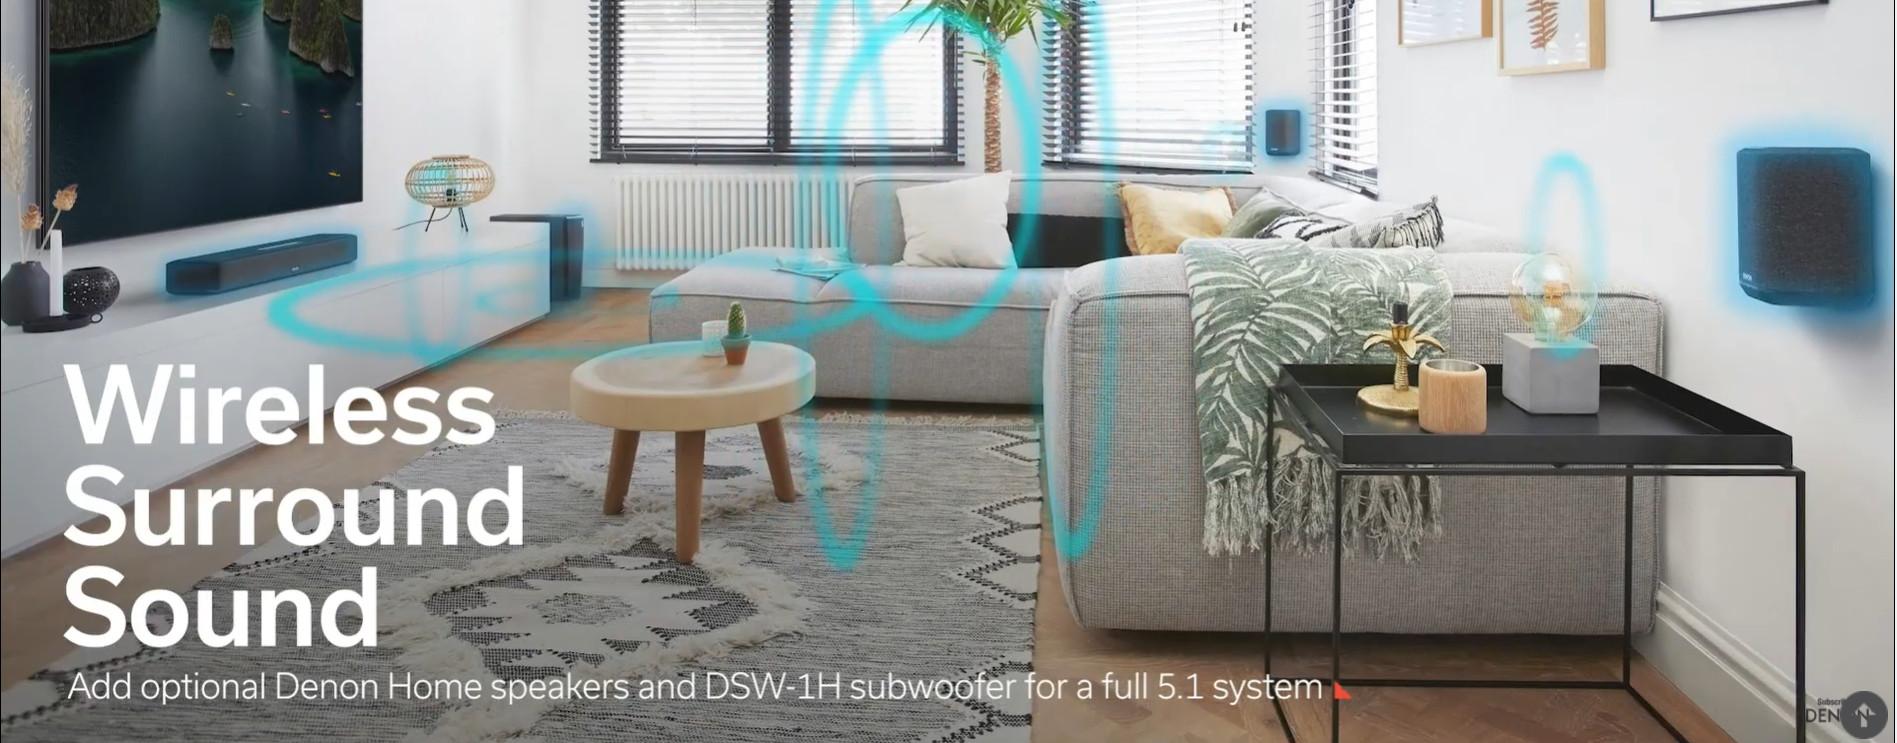 Denon Home Sound Bar 550 | Anh Duy Audio